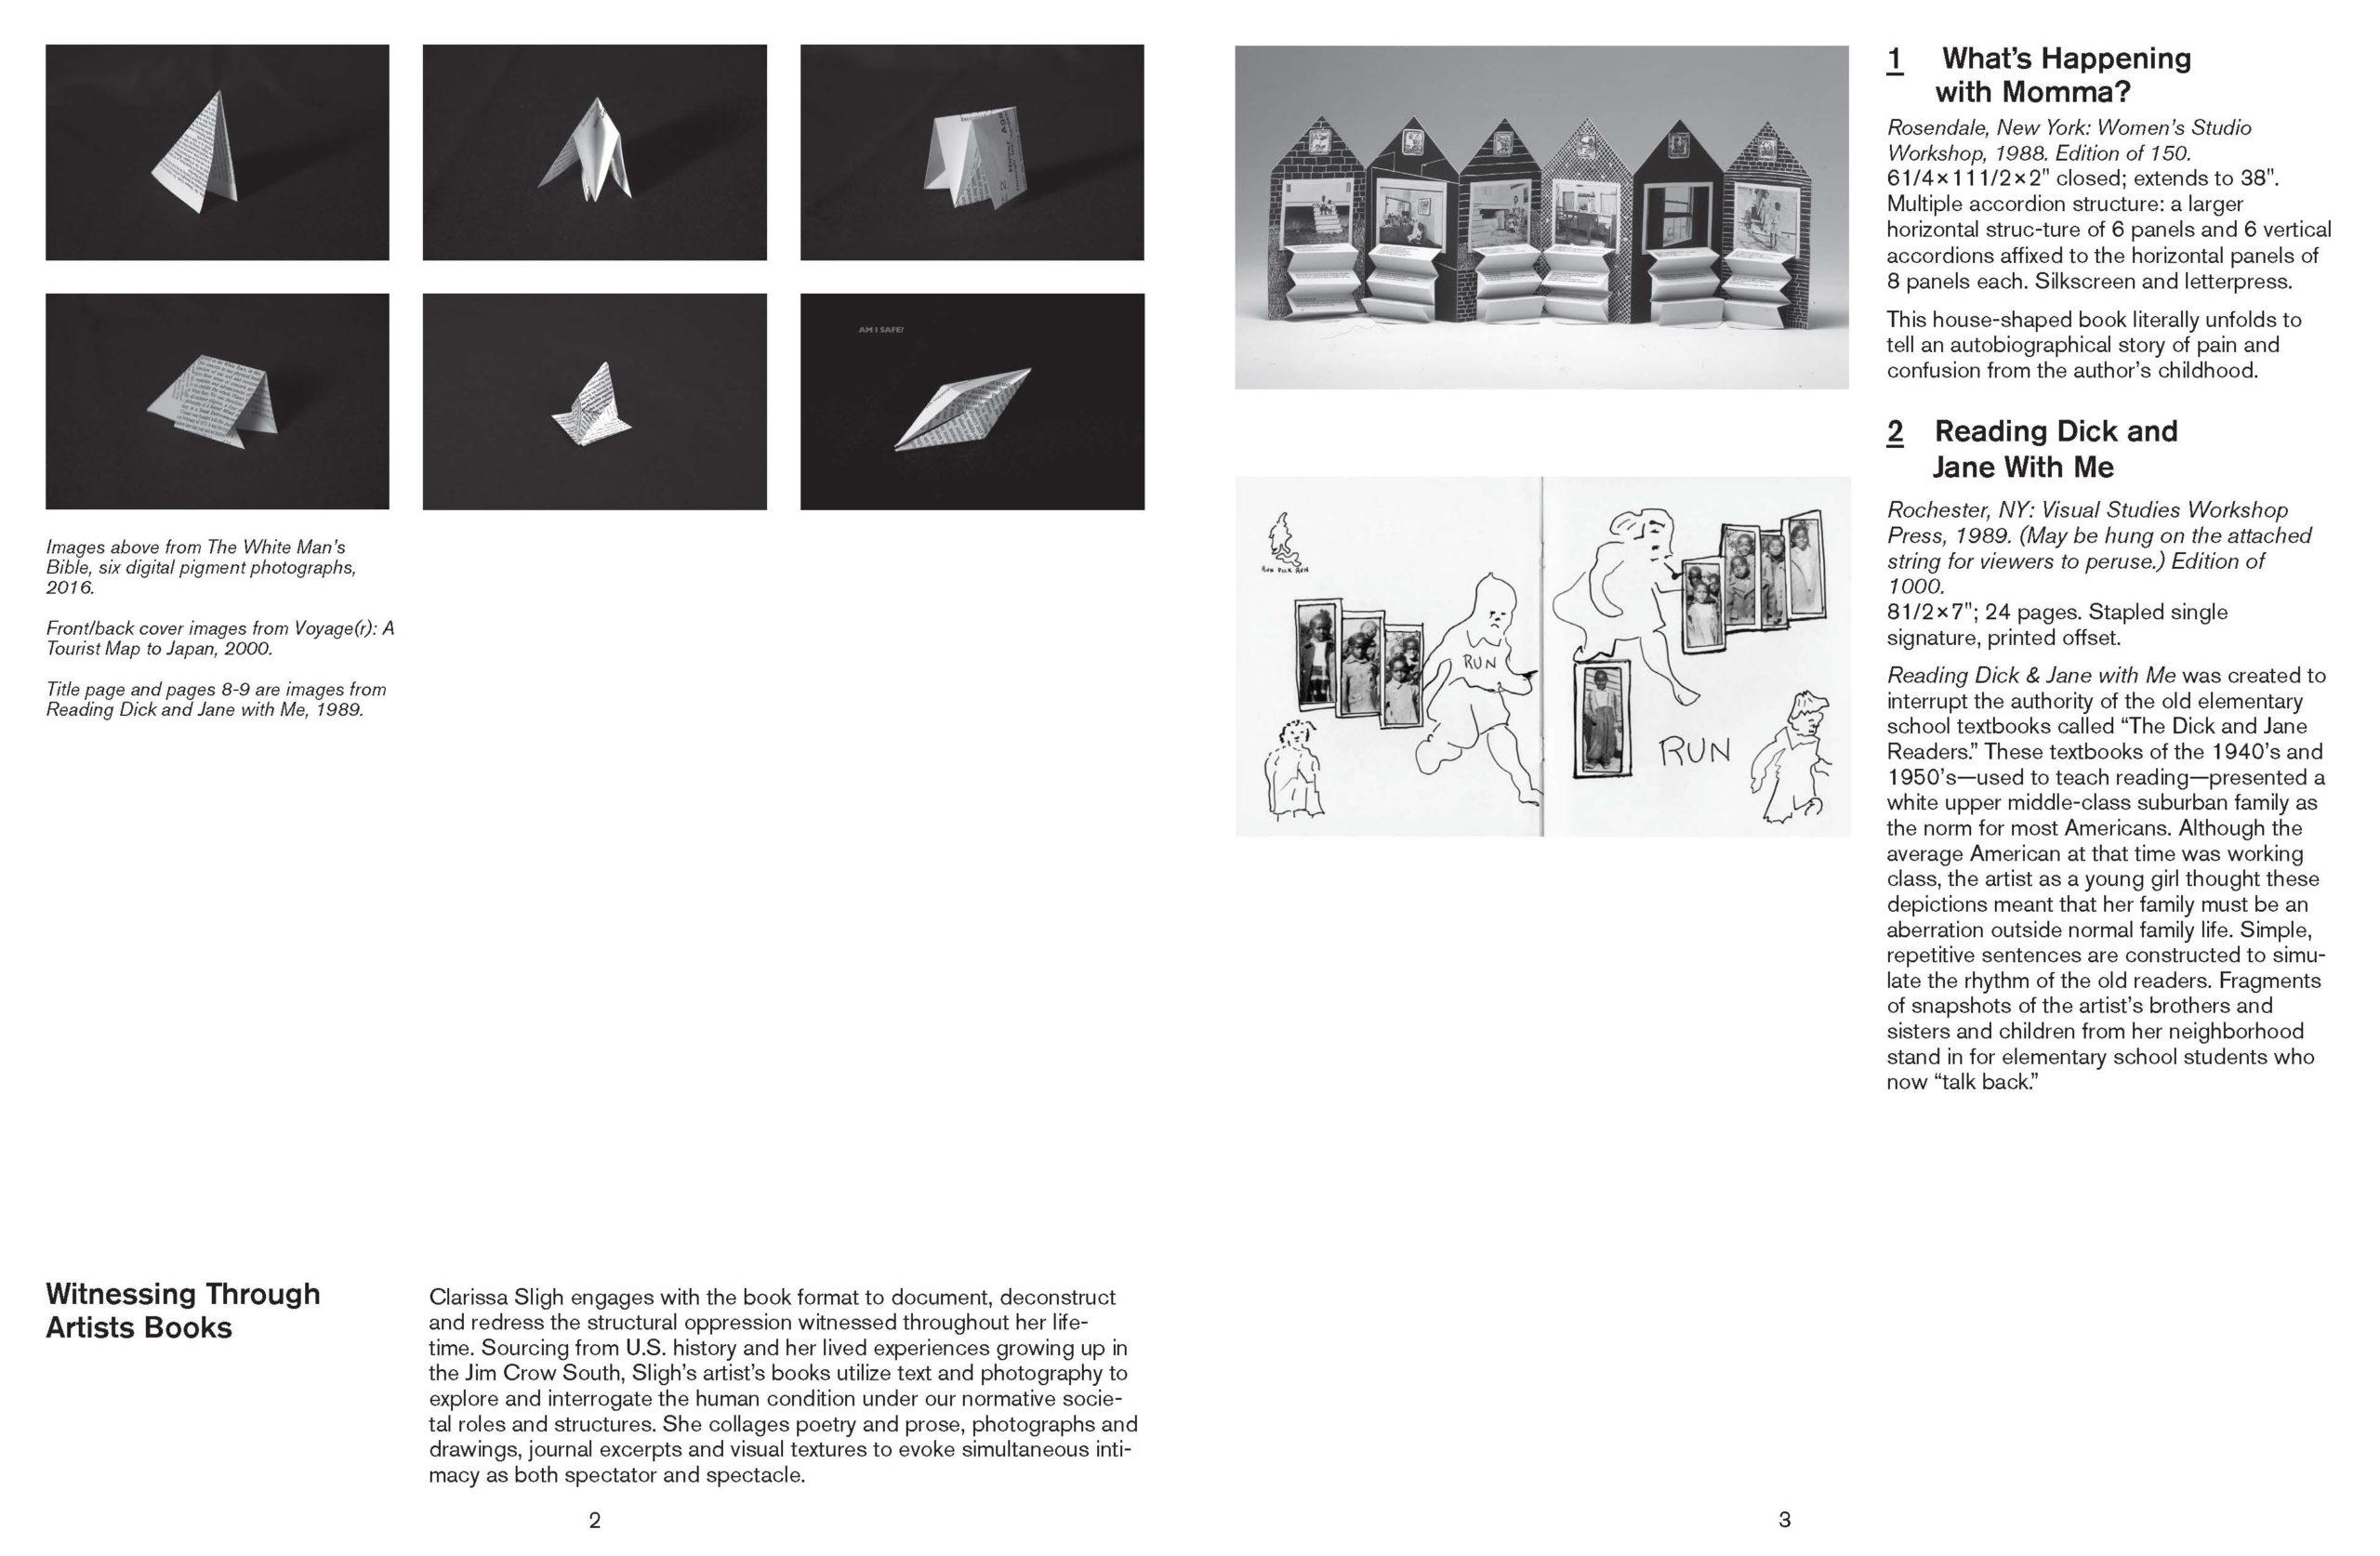 page 4 & 5 of Witnessing Through Artist's Books: Clarissa Sligh brochure